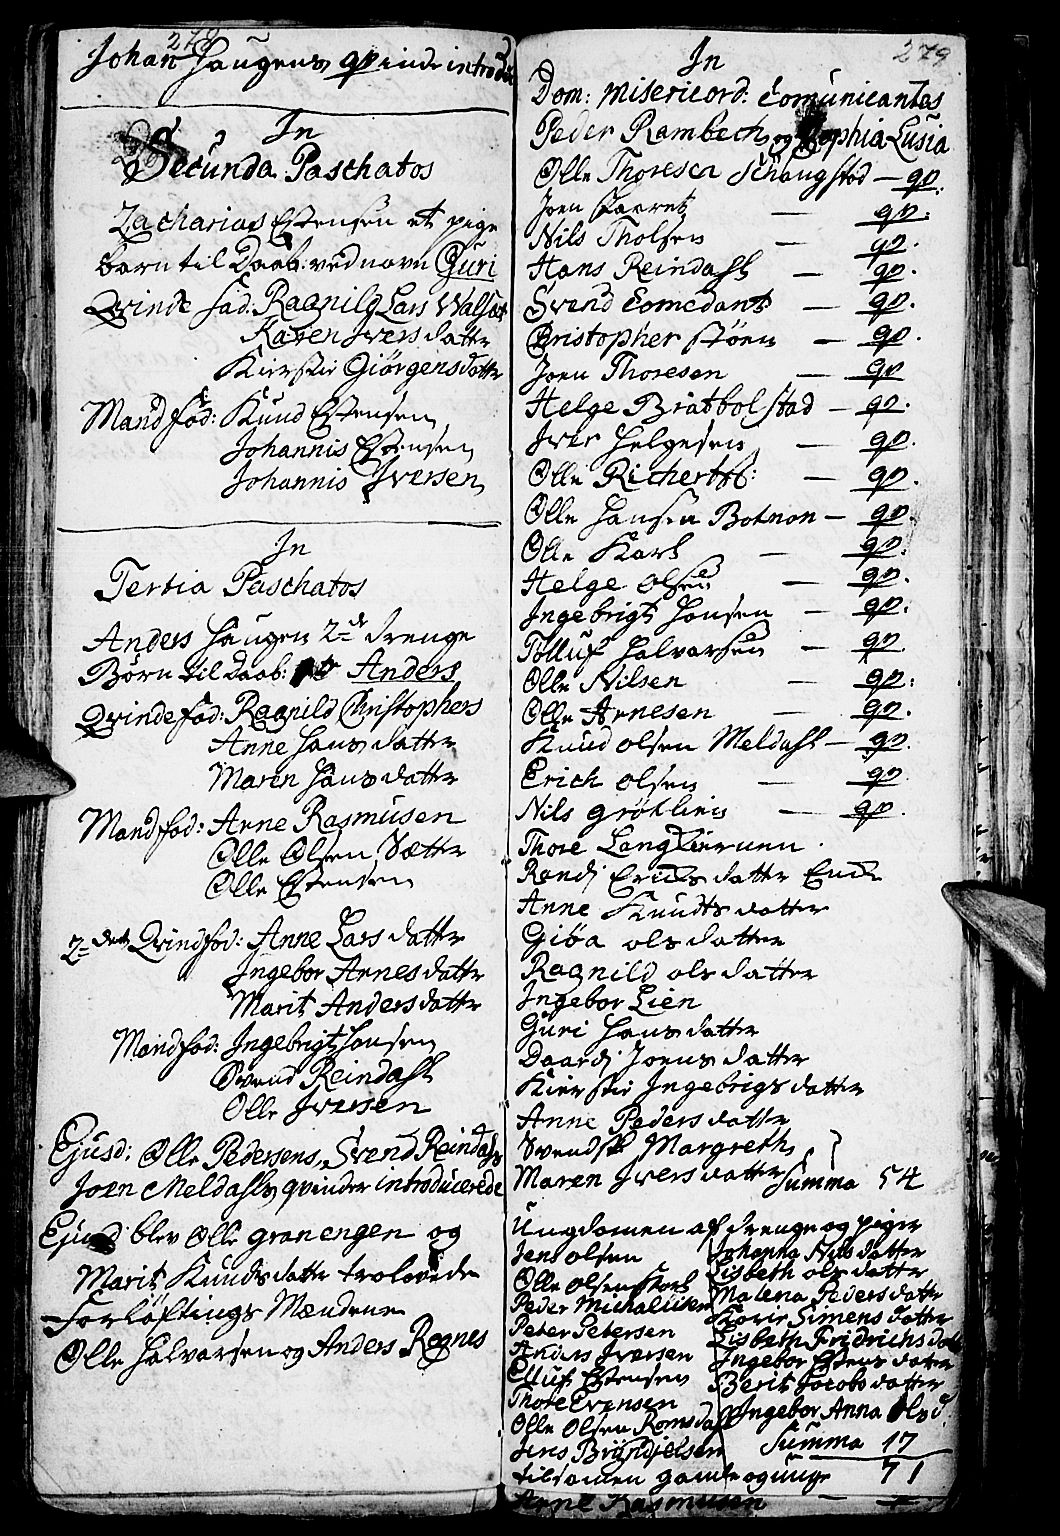 SAH, Kvikne prestekontor, Ministerialbok nr. 1, 1740-1756, s. 278-279